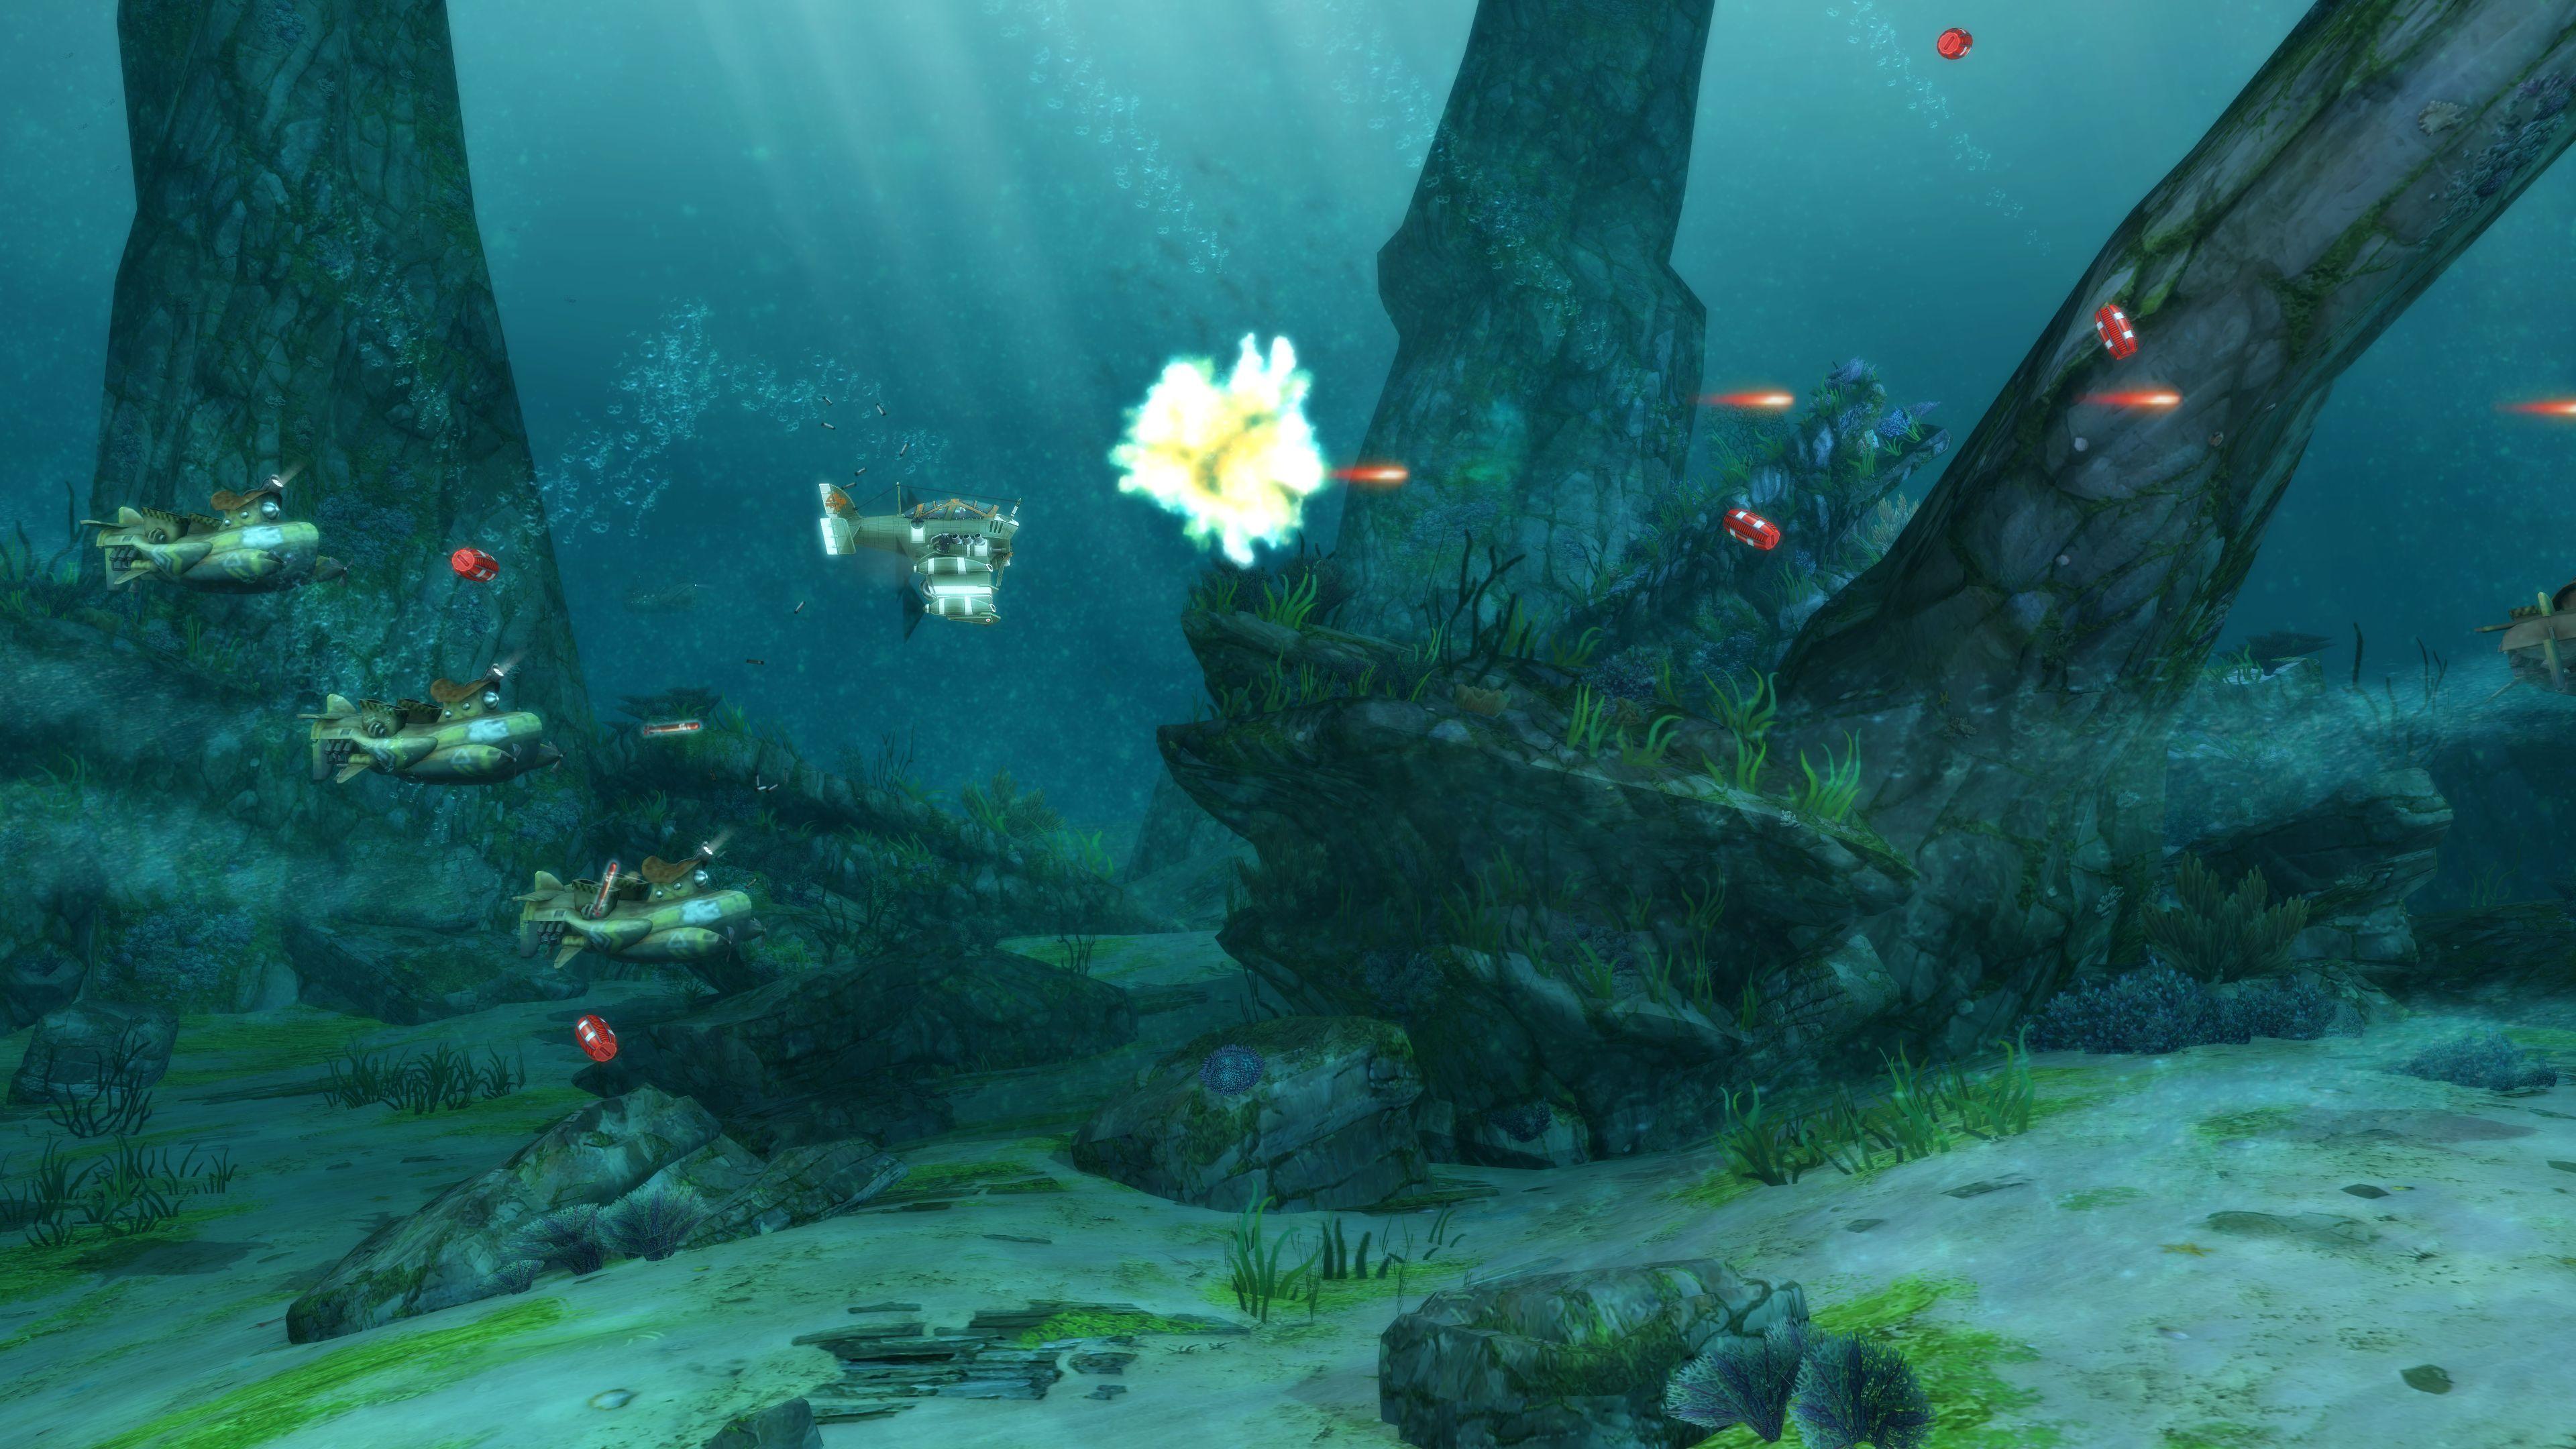 Hry pro Switch se rozrostou o Battle Chasers: Nightwar a Sine Mora EX 142181